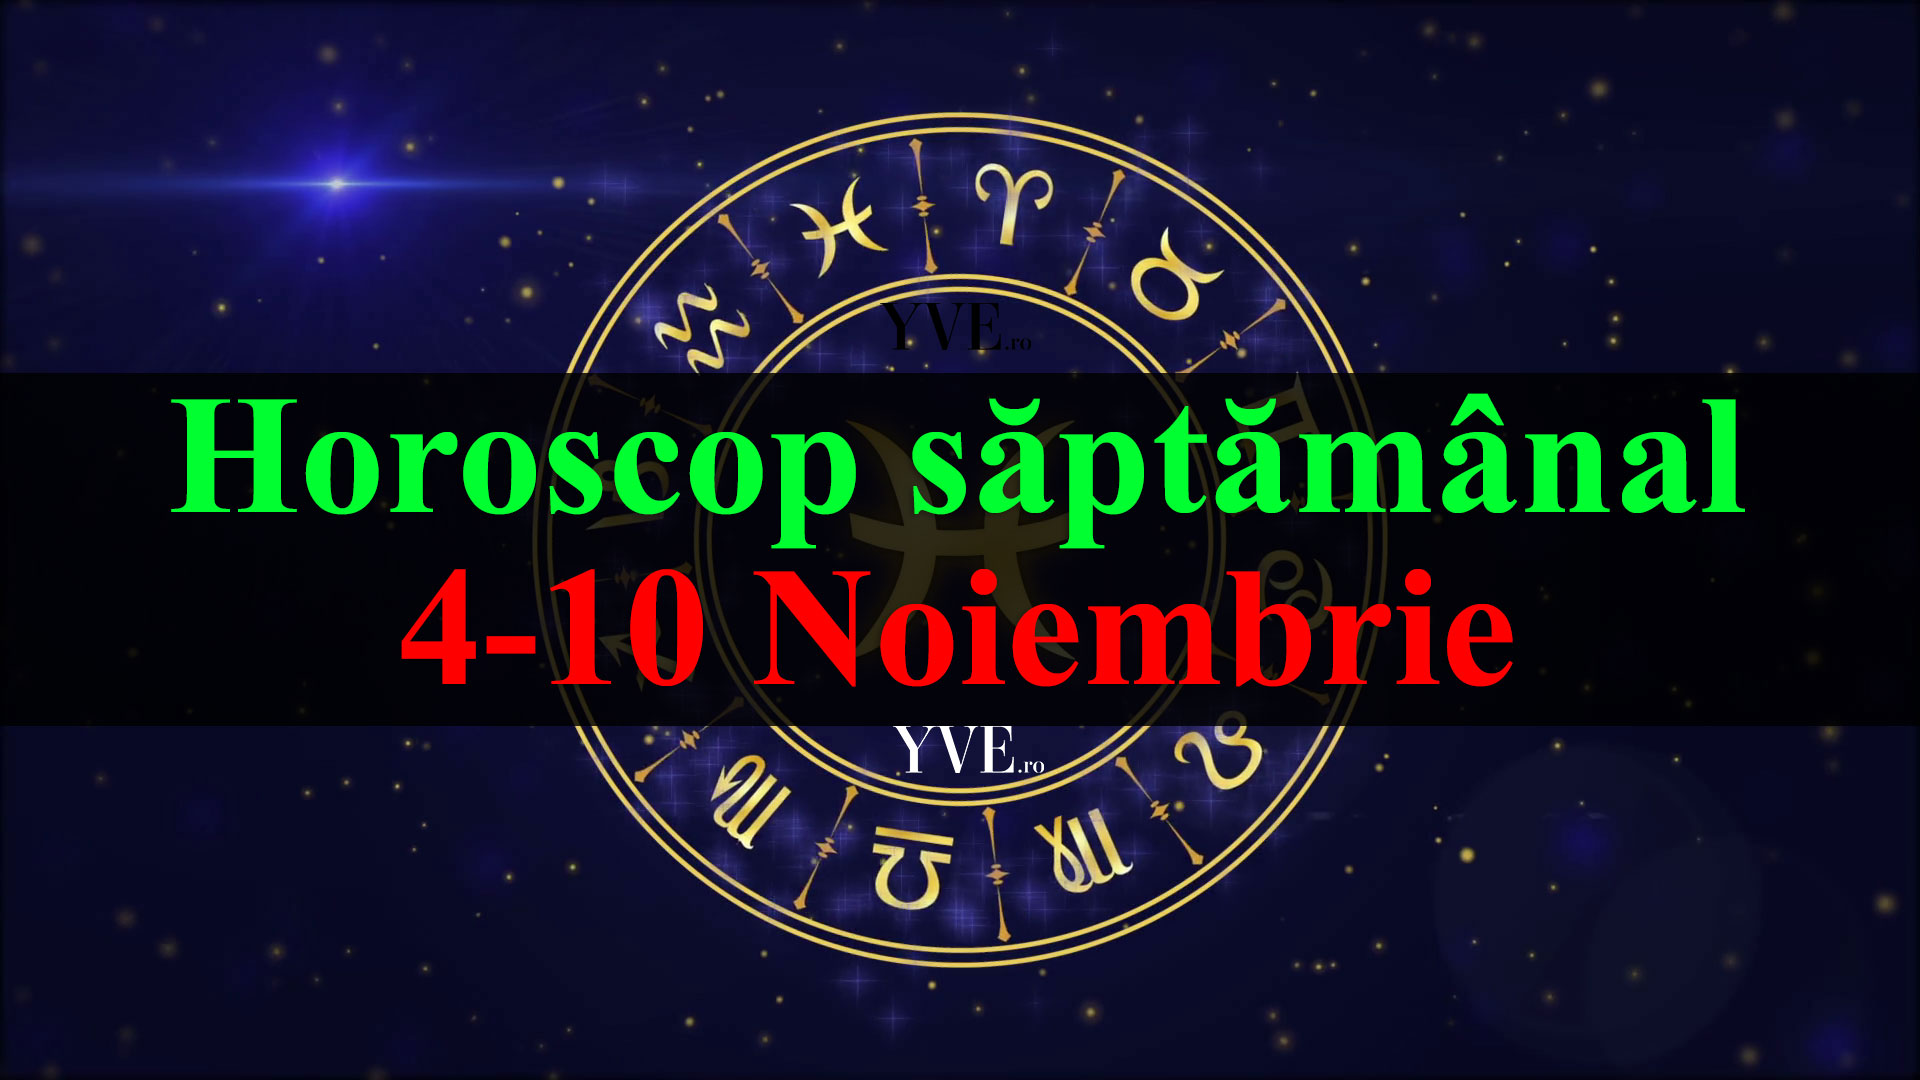 Horoscop saptamanal 4-10 Noiembrie 2019